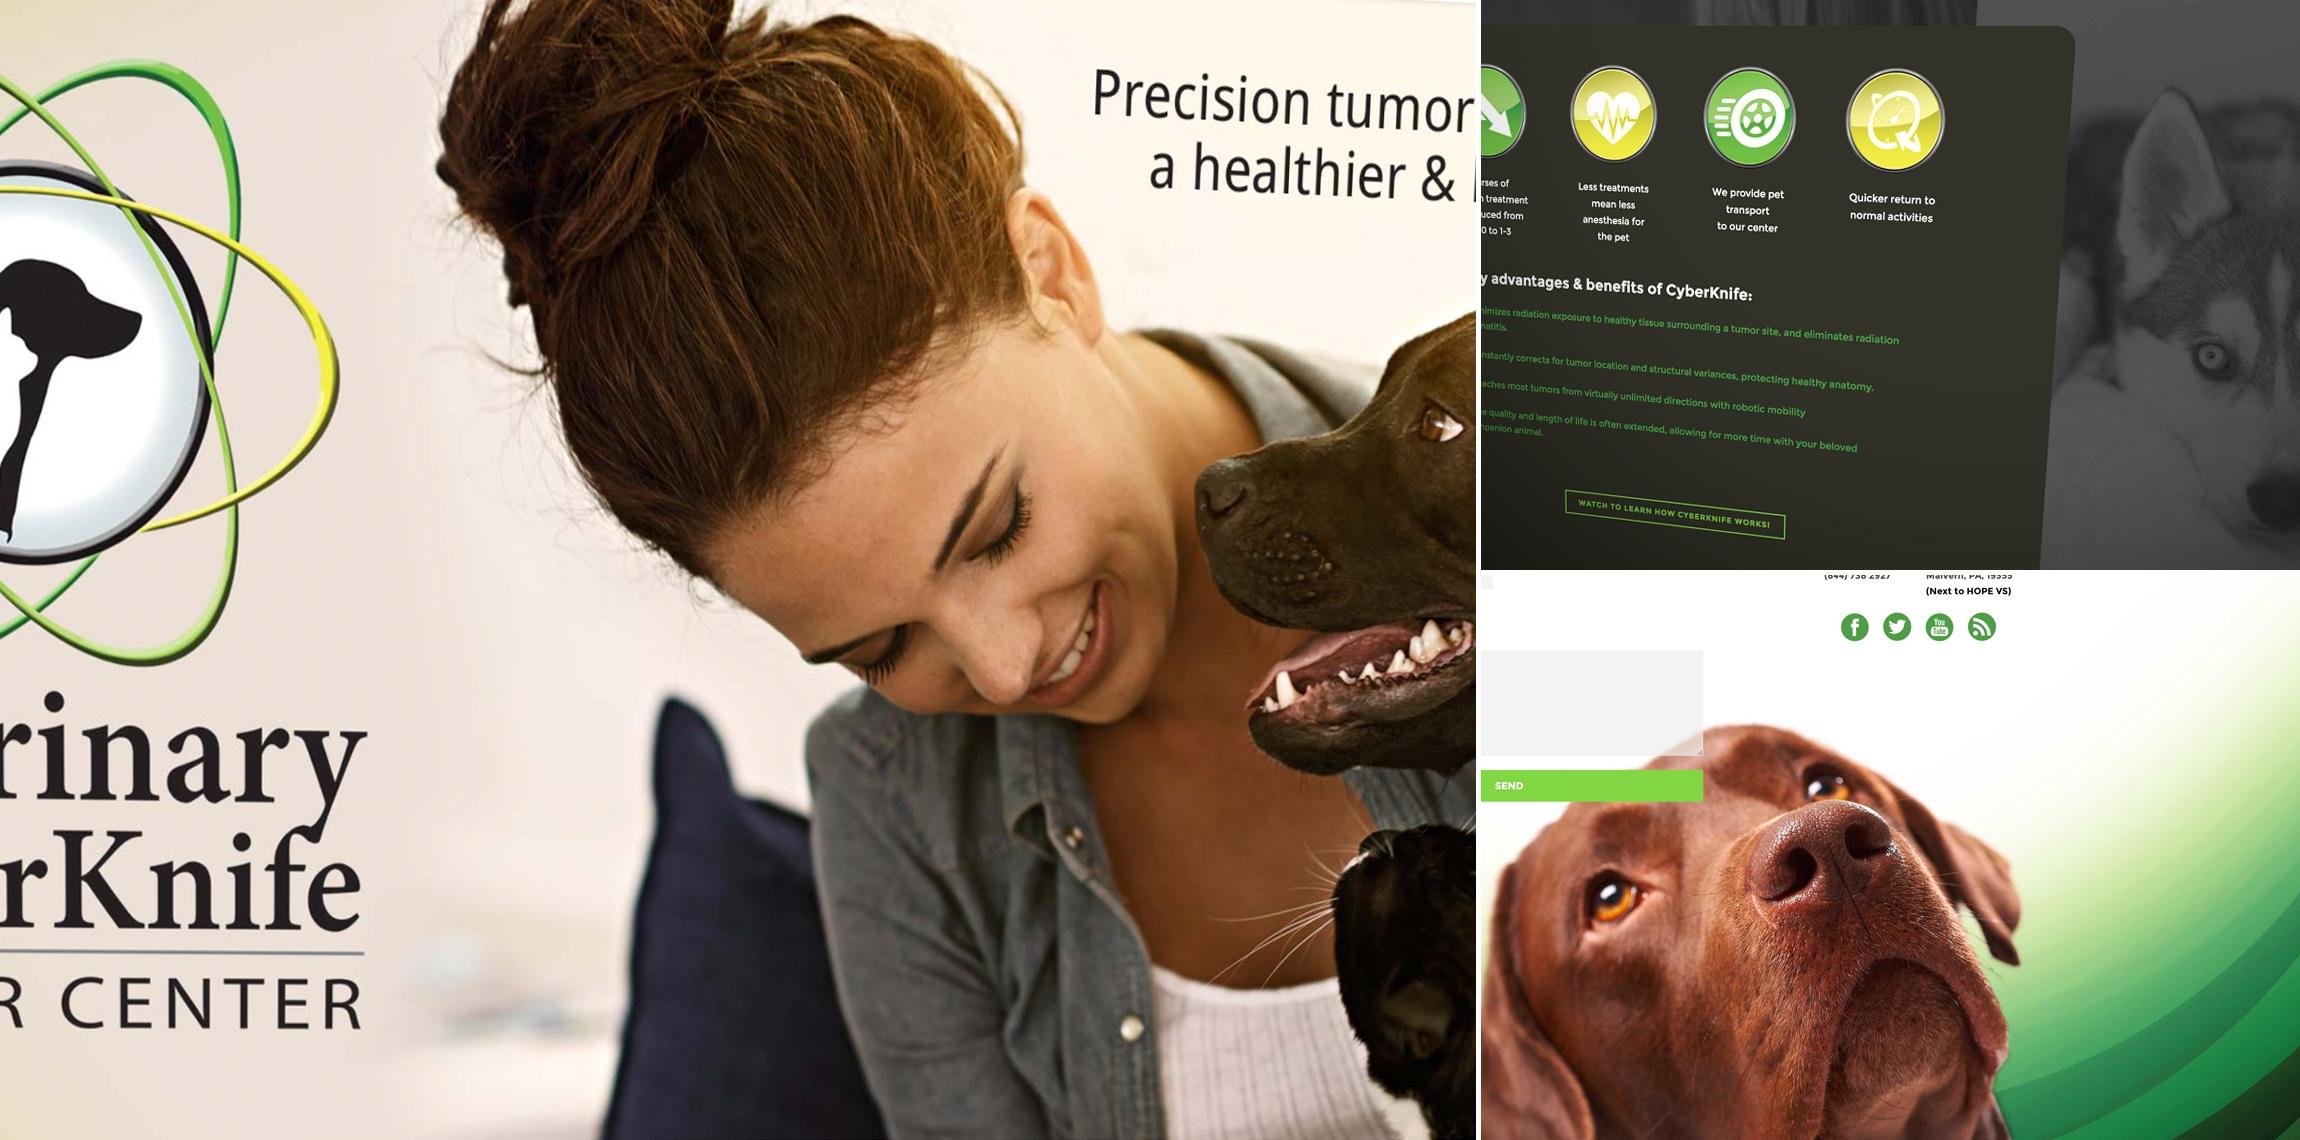 Veterinary CyberKnife: Tradeshow Booth